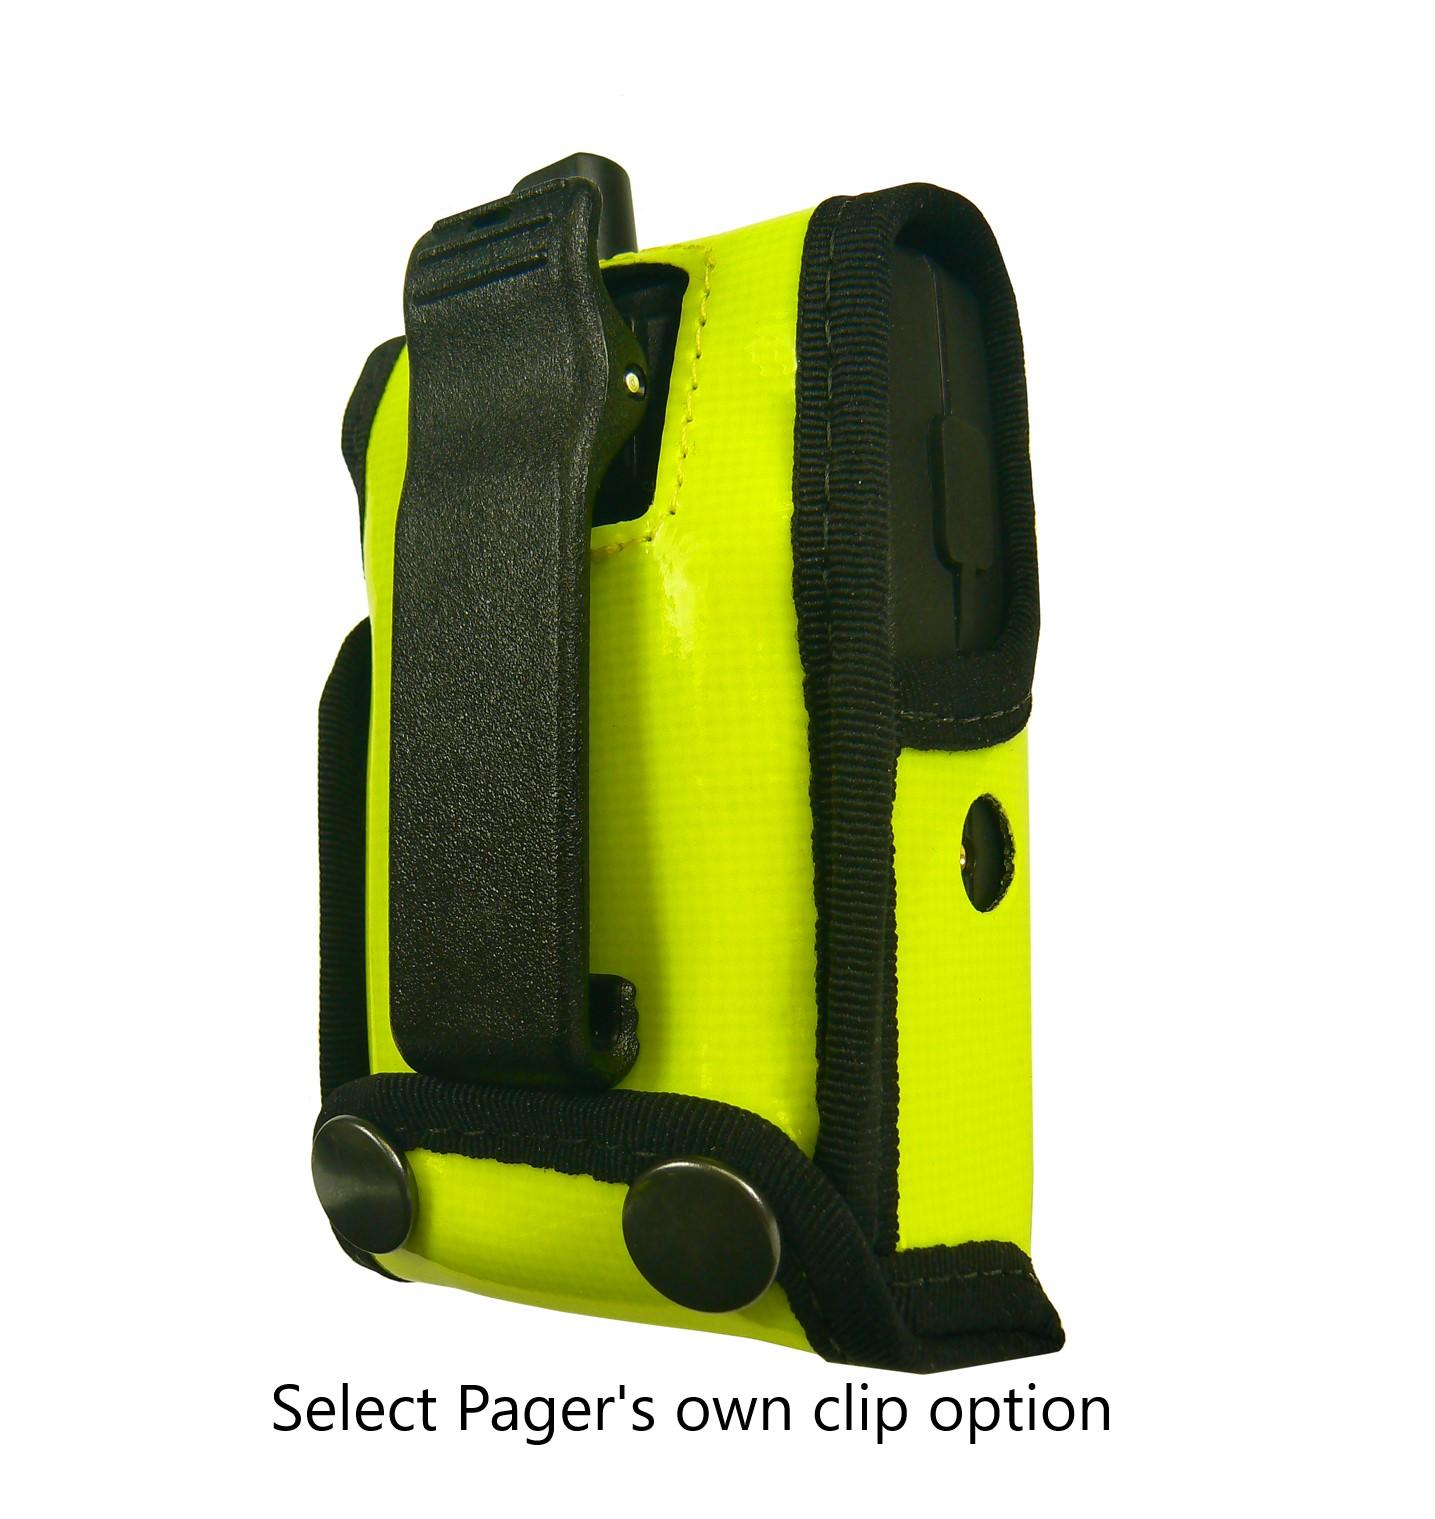 Pager Case Oelmann Viper Hi-Vis Yellow